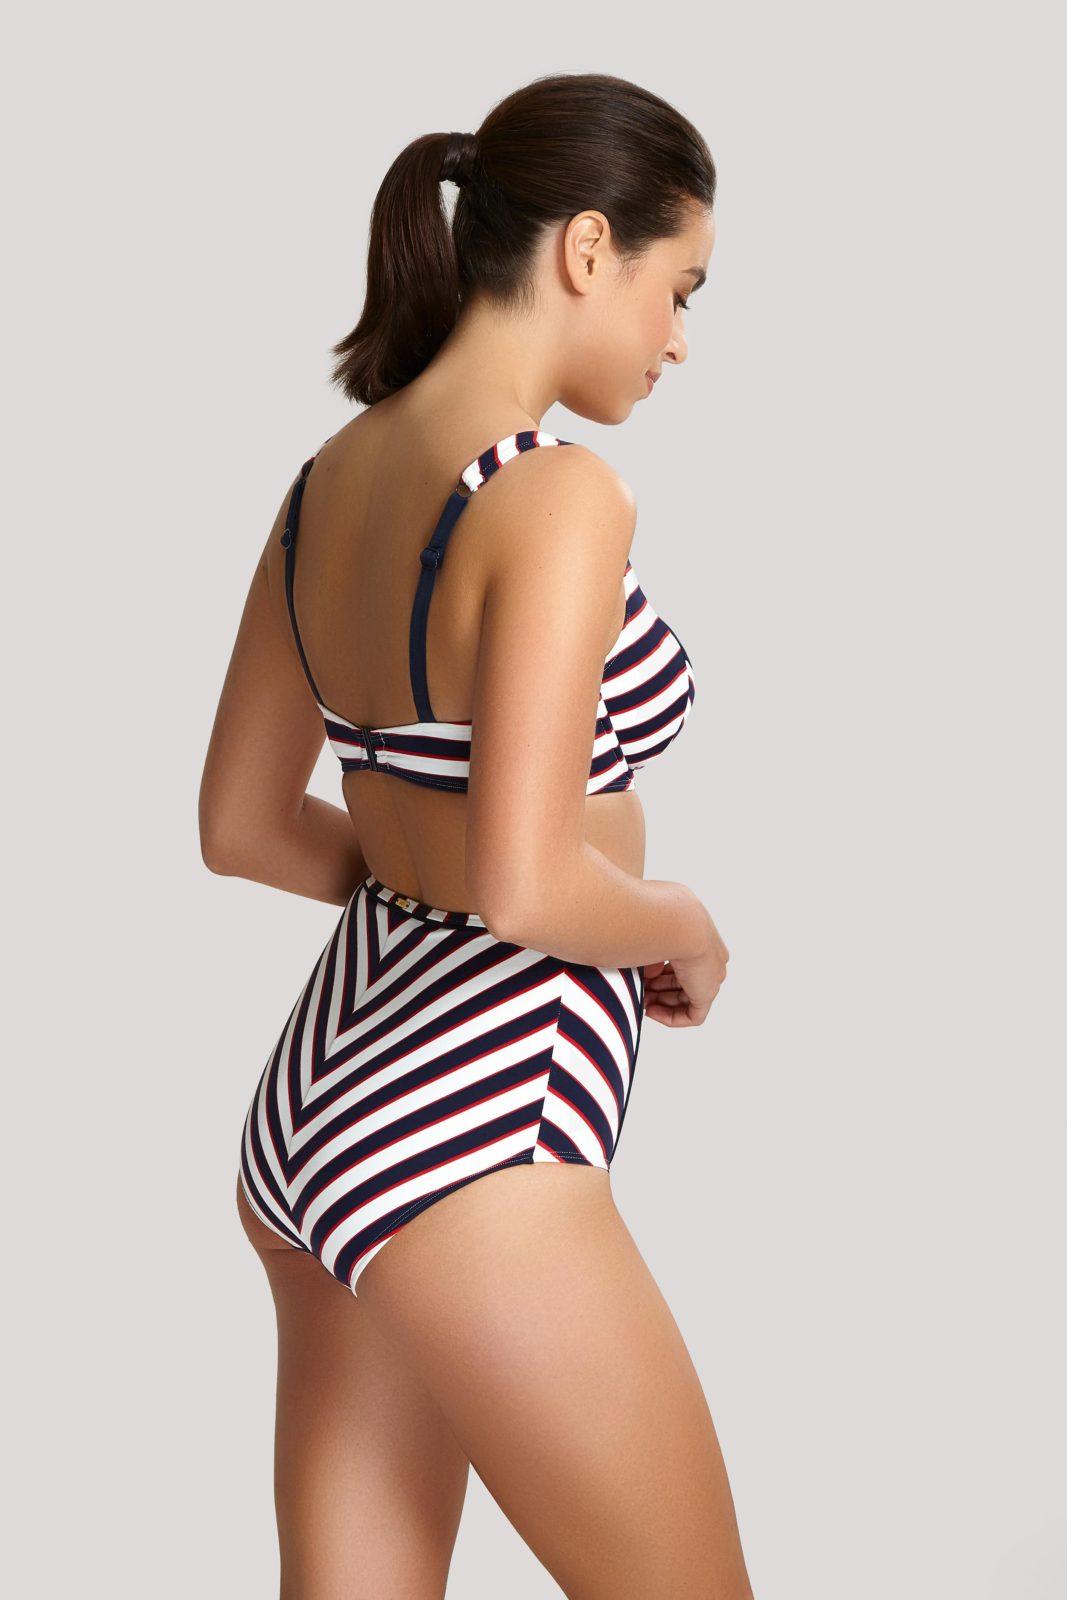 Купальники SW1372_622_2 Lucille Balconnet Bikini Top Navy Stripe T F 2-min